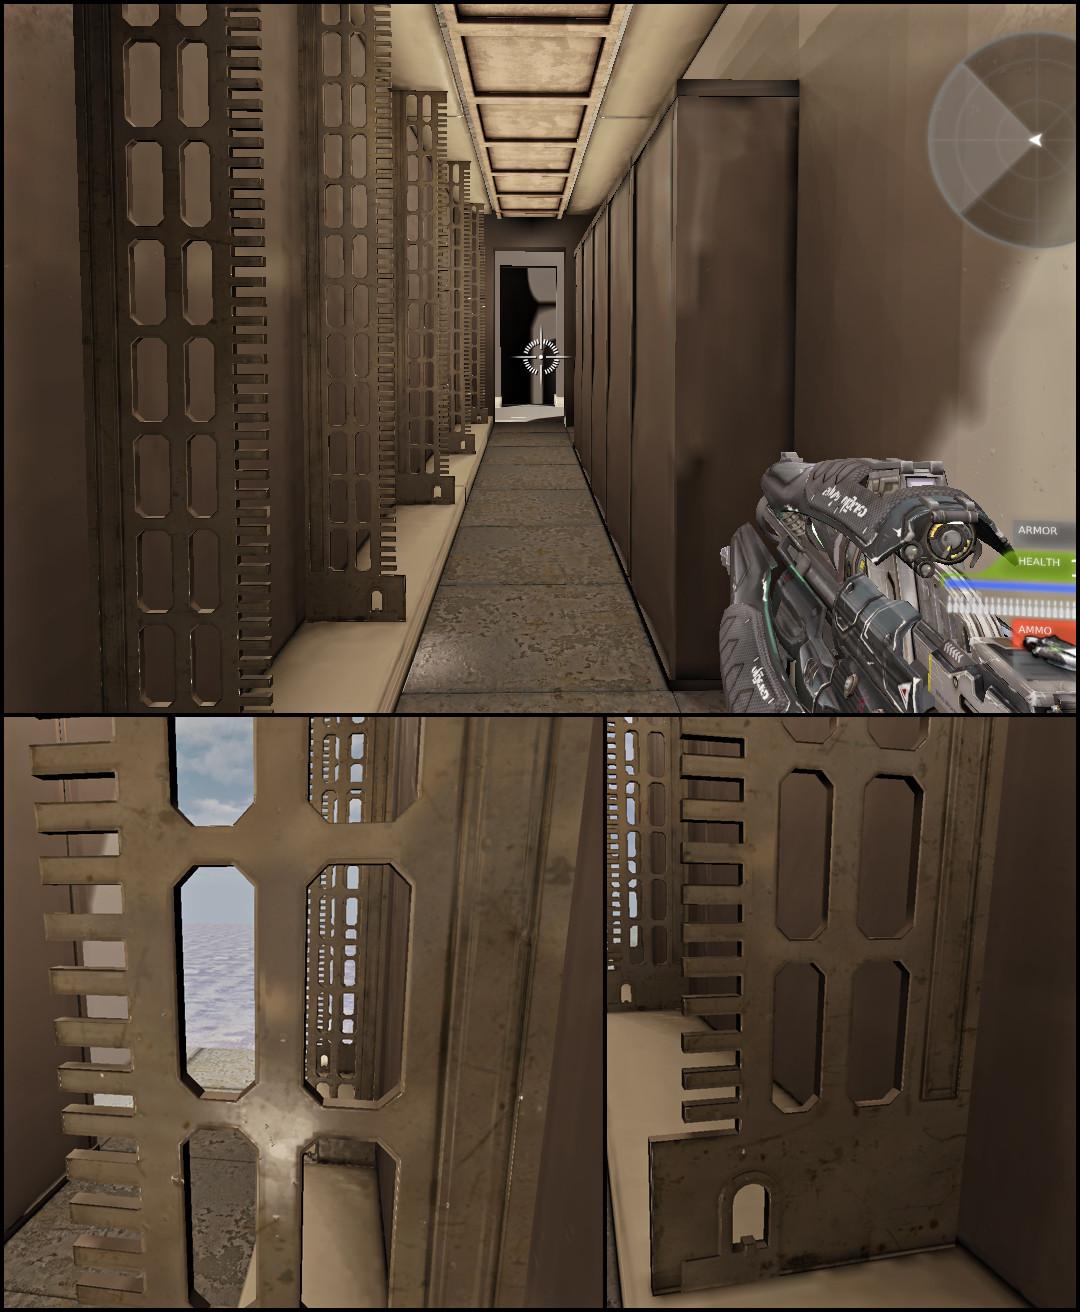 Francisco cruz hallway 05